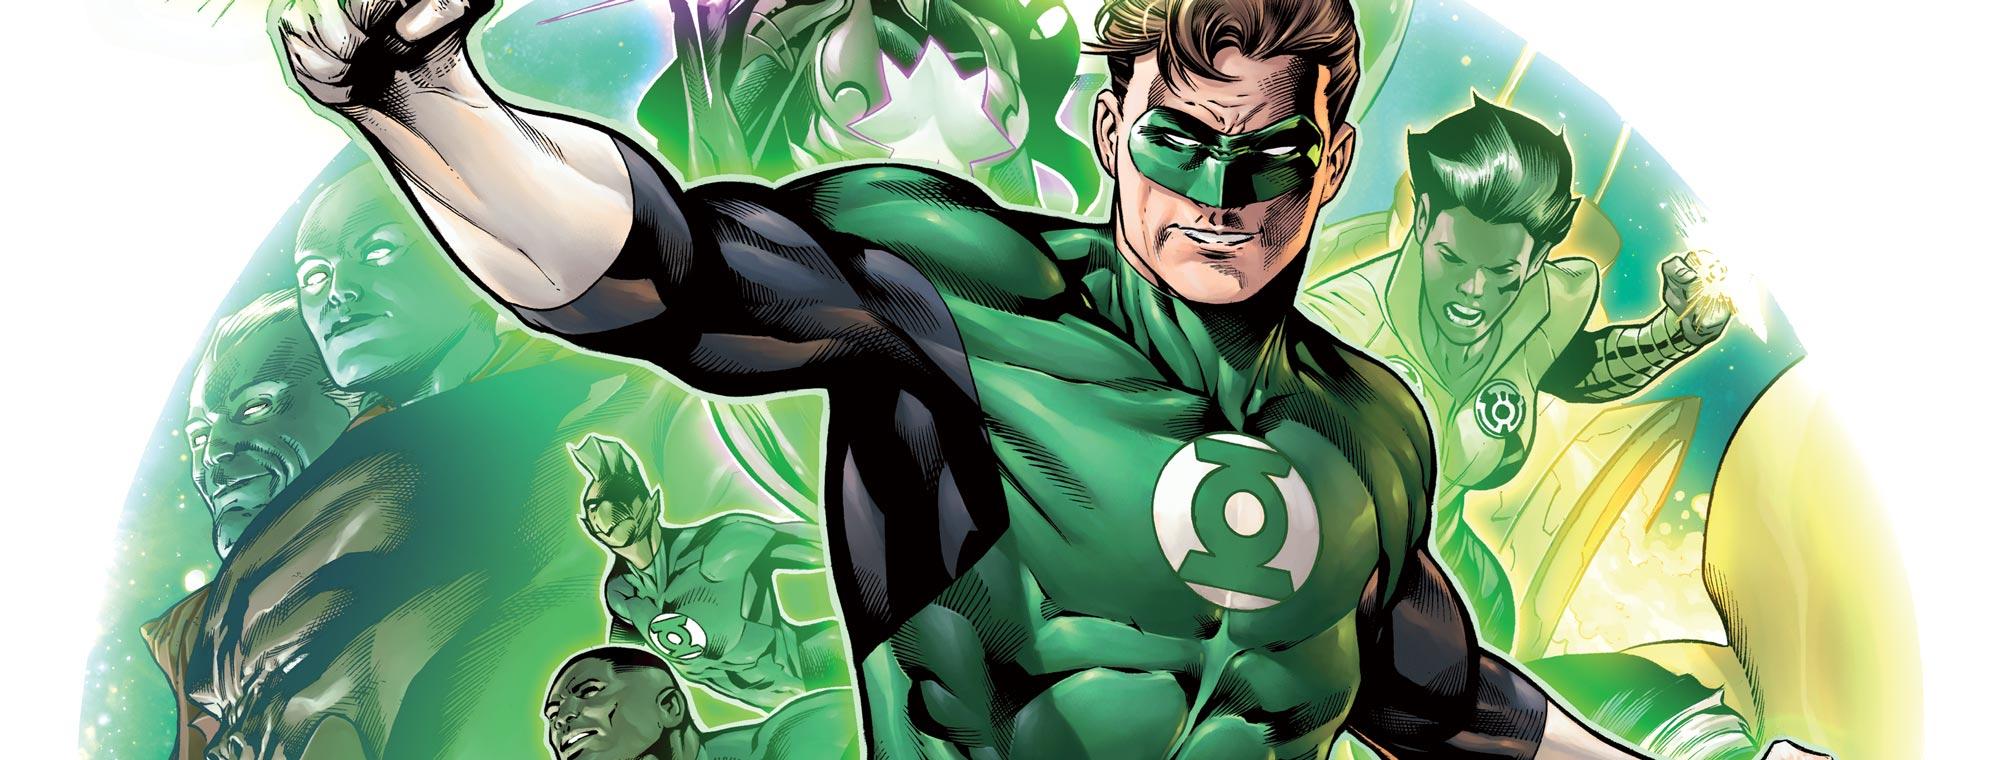 L'adaptation de Green Lantern par Martin Campbell date de: